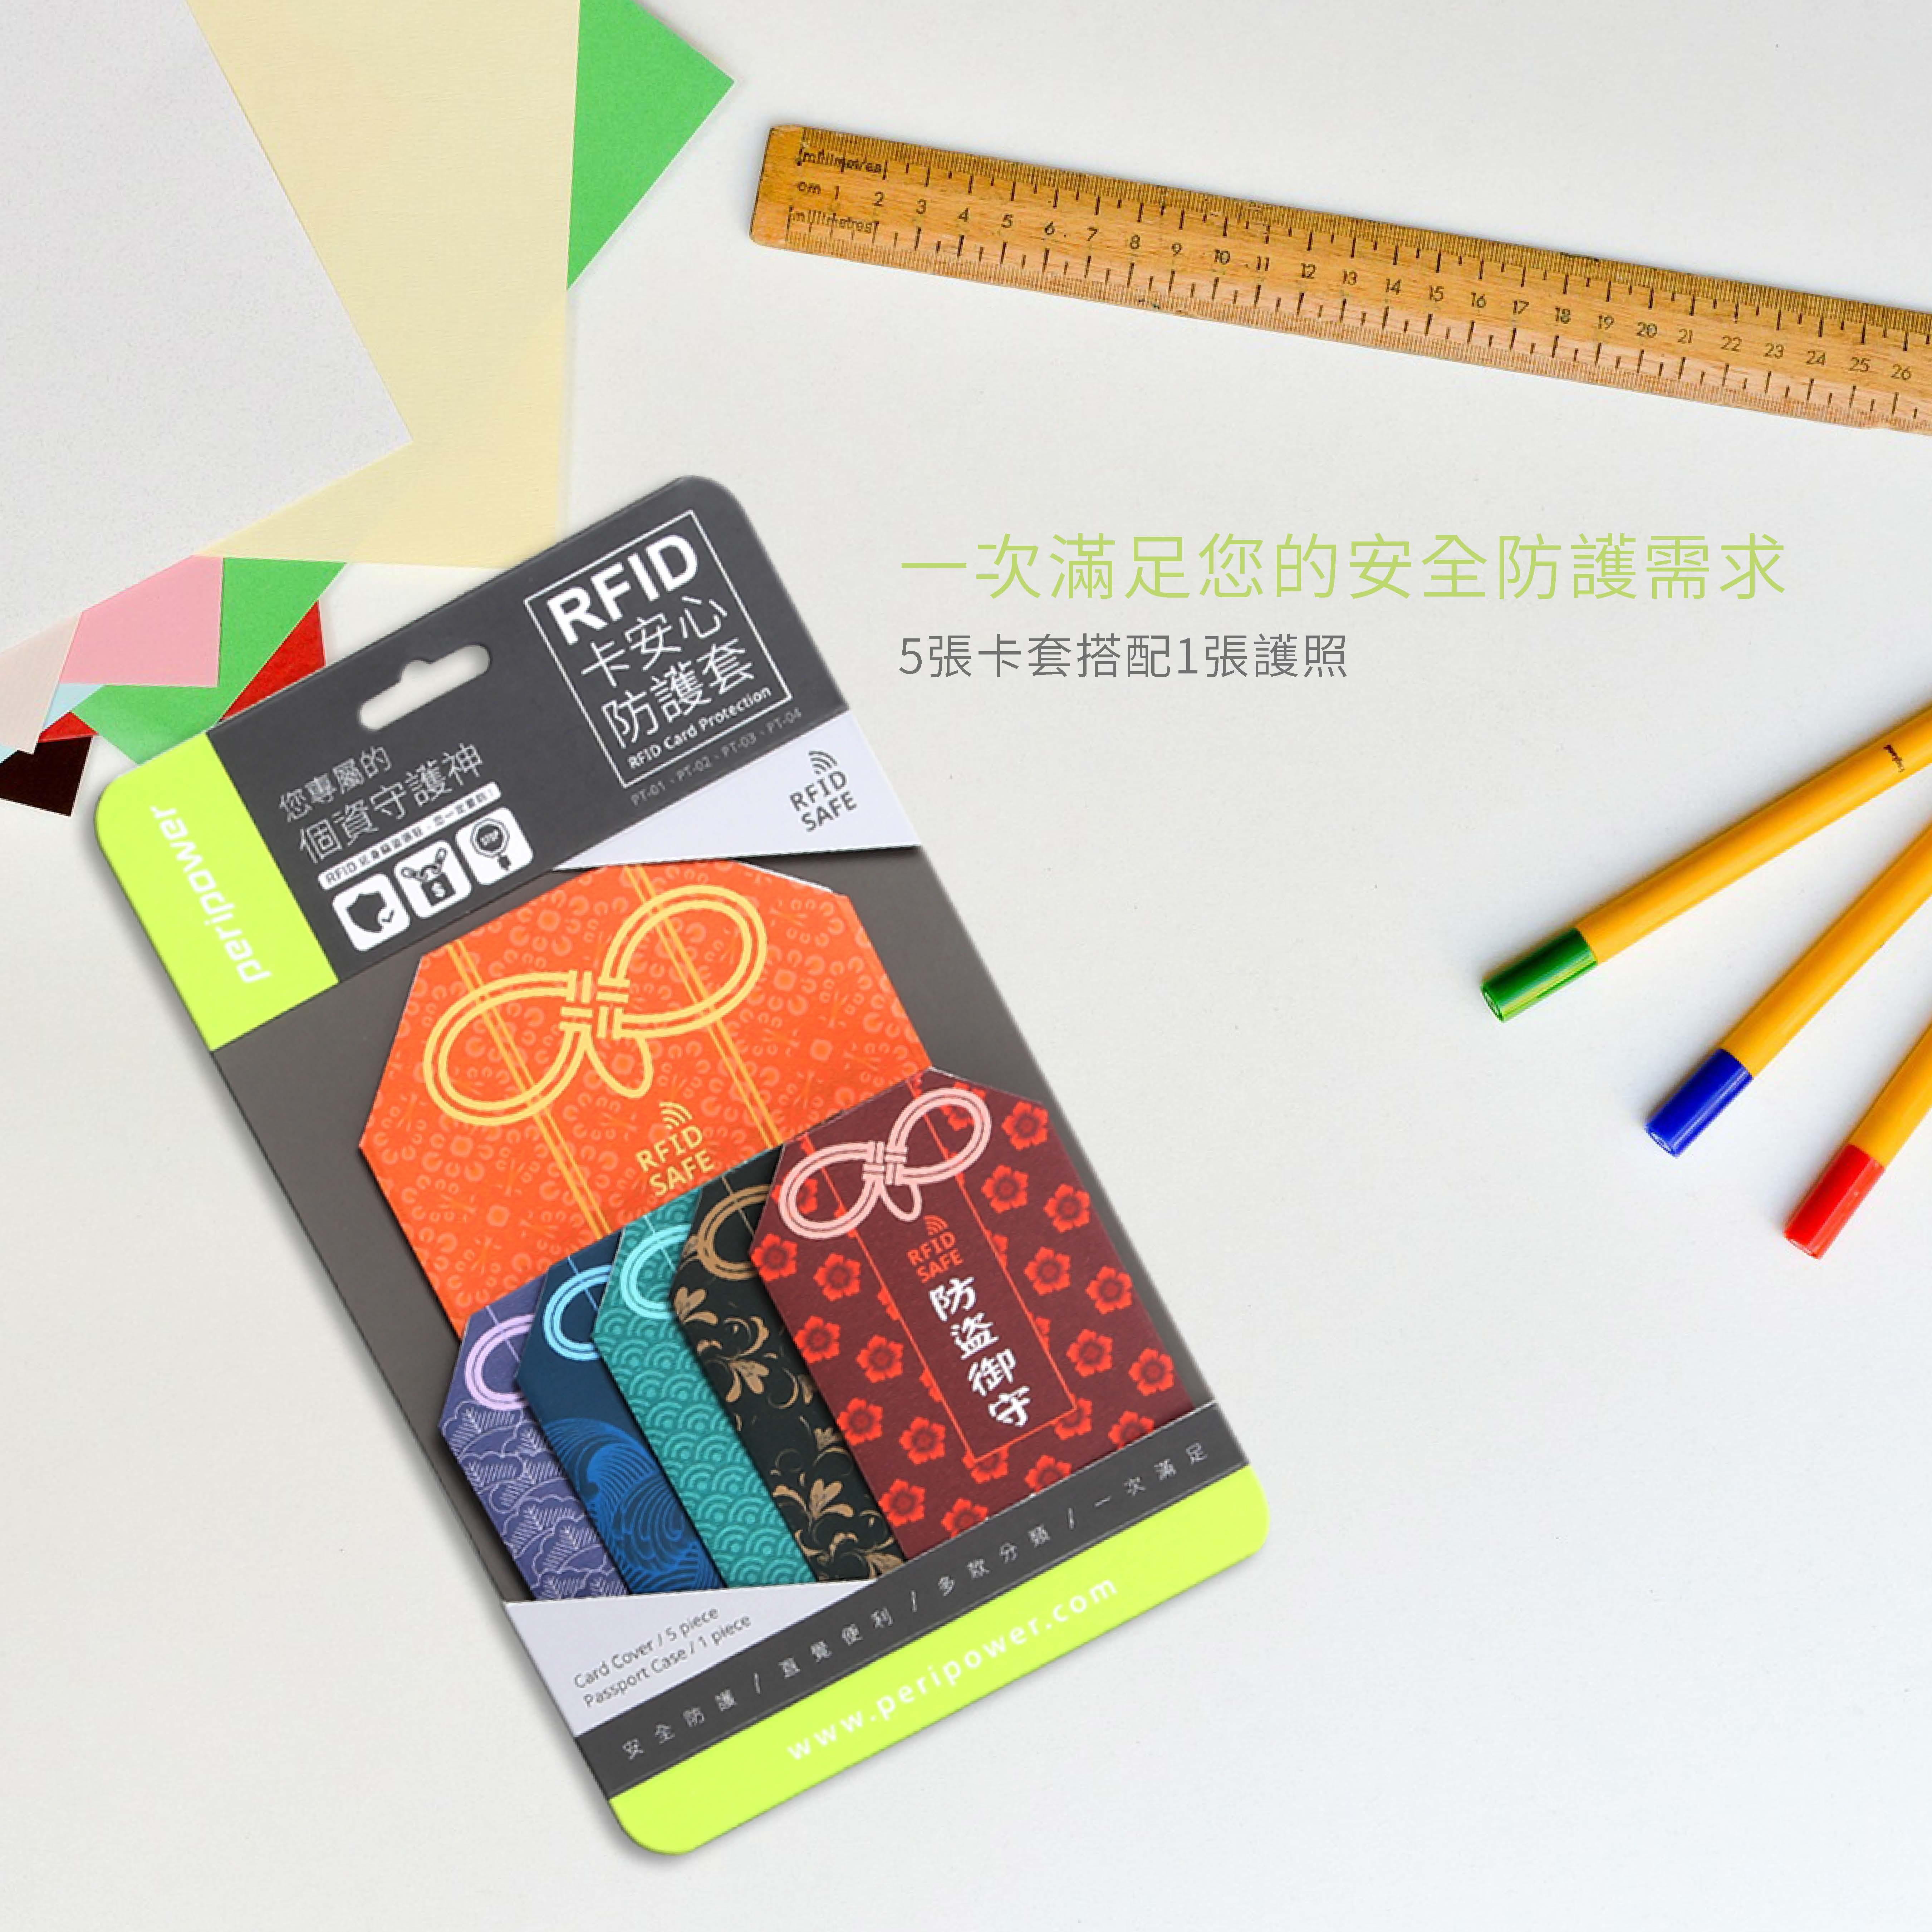 RFID卡安心防護套頁面製作_v1.0_頁面_4